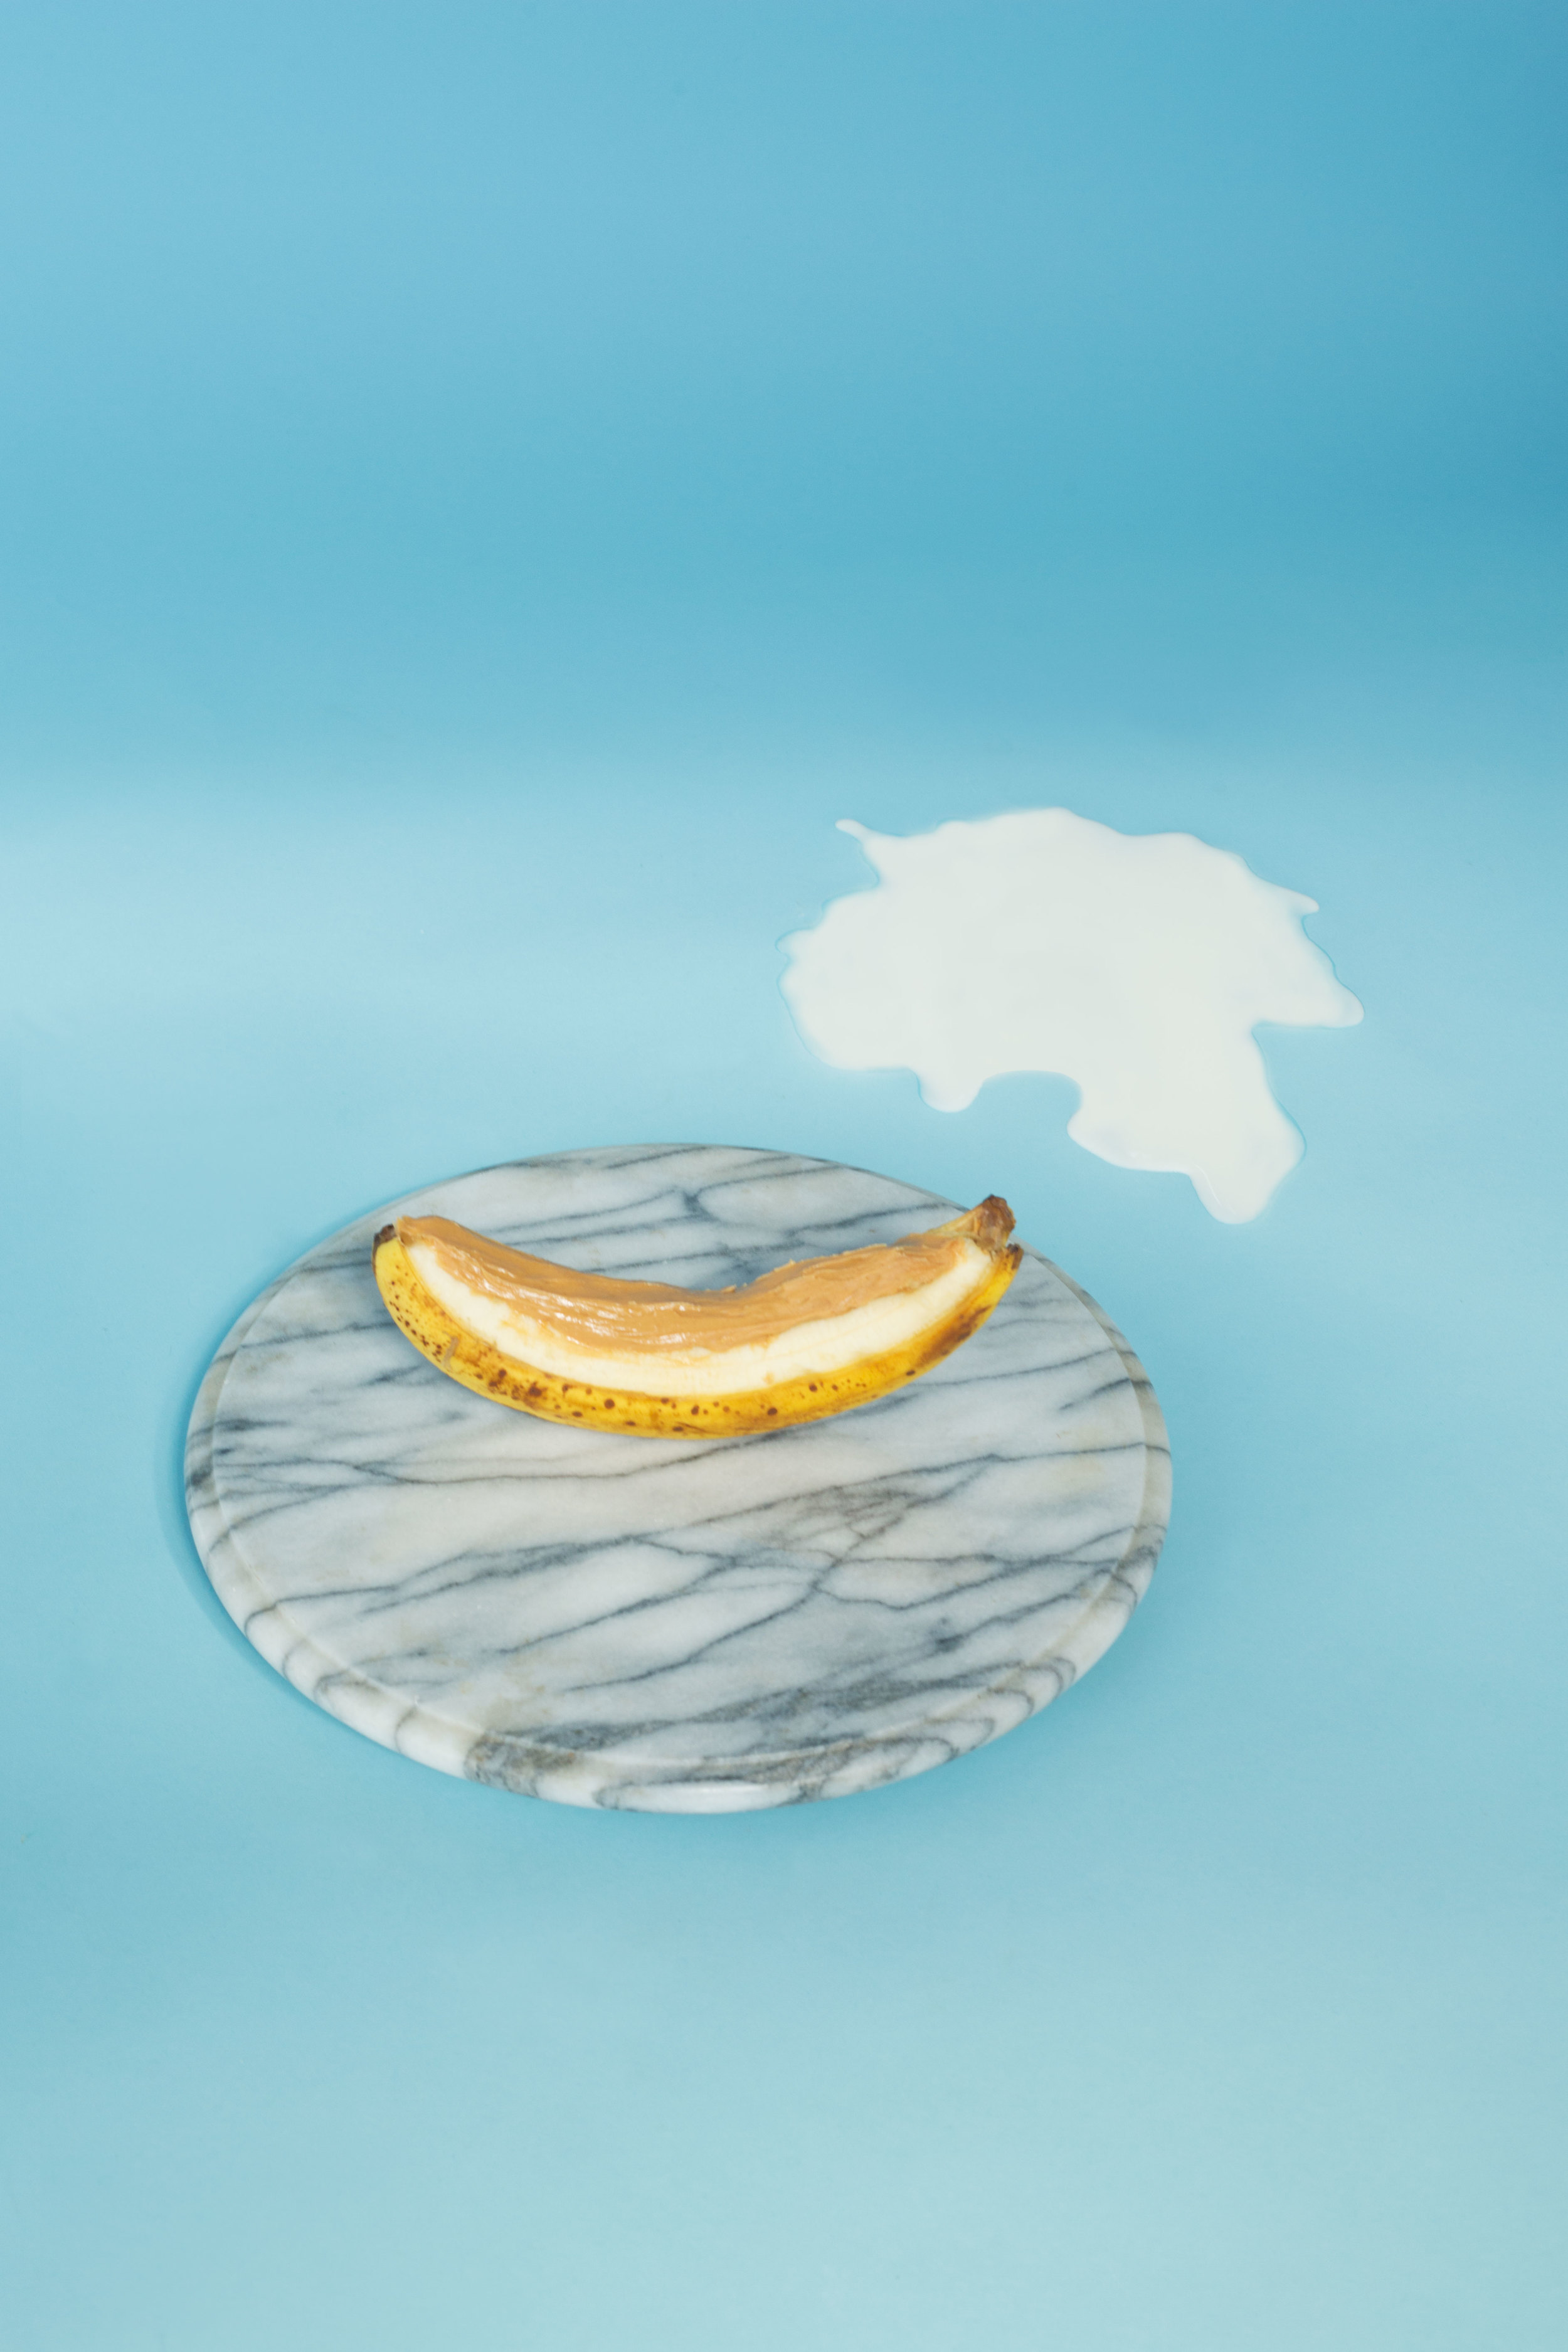 banana_web.jpg